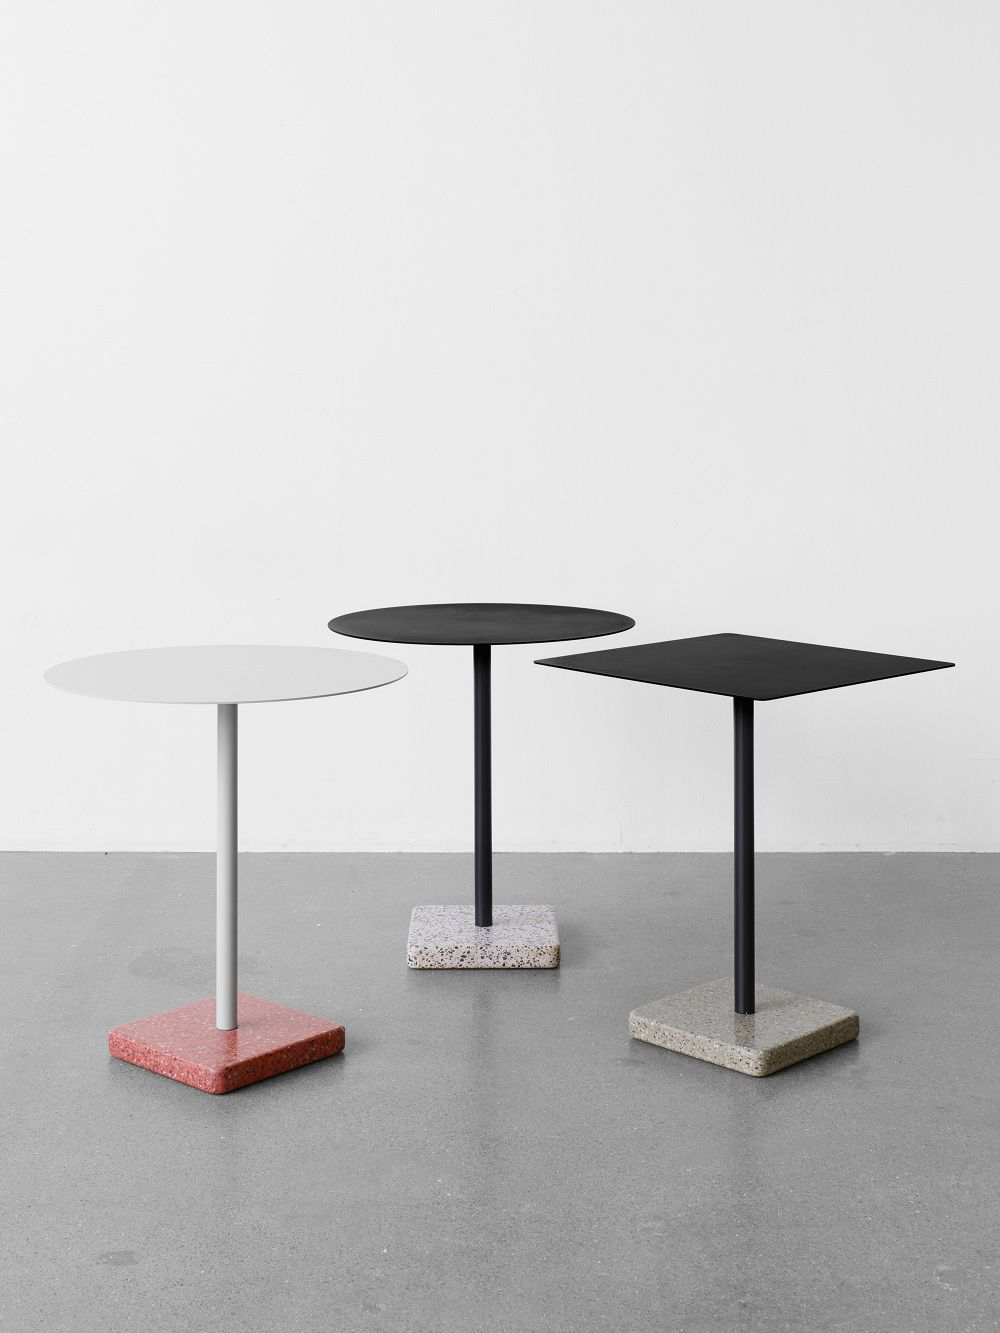 Terrazzo Table - HAY (DK) - Daniel Enoksson Studio | ʧ ʳϜȹ ːʳ˳ɛ ...